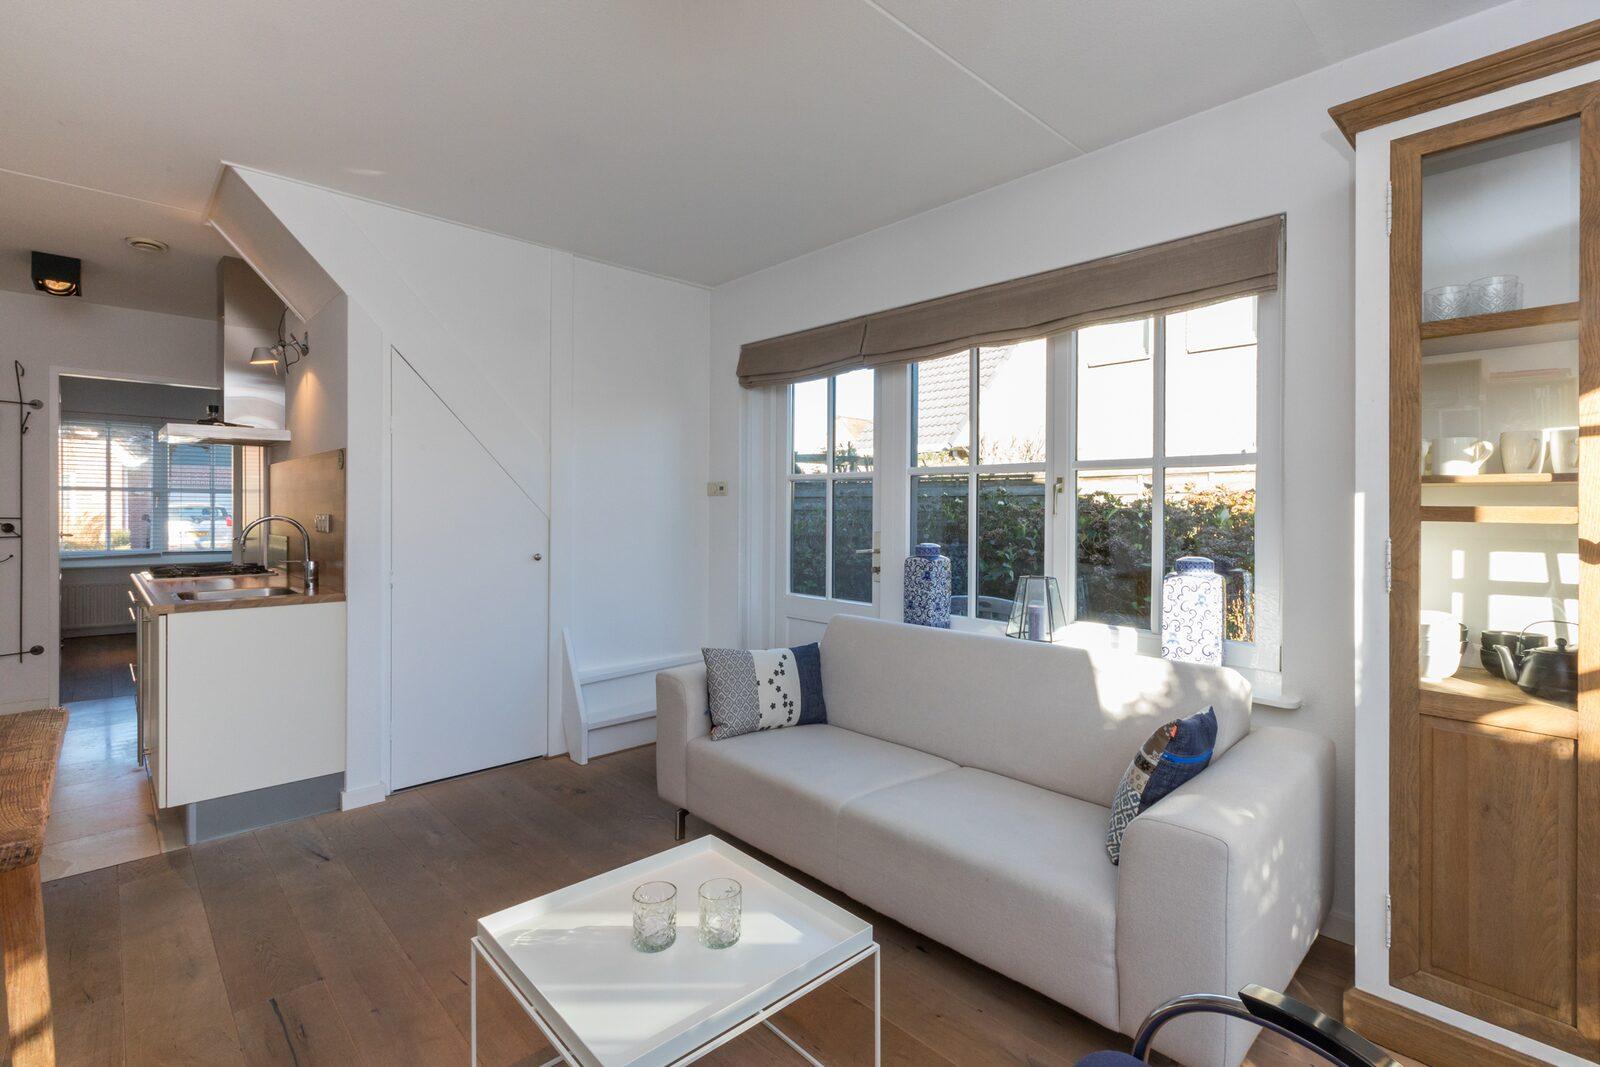 Appartement - Borne 56a | Zoutelande